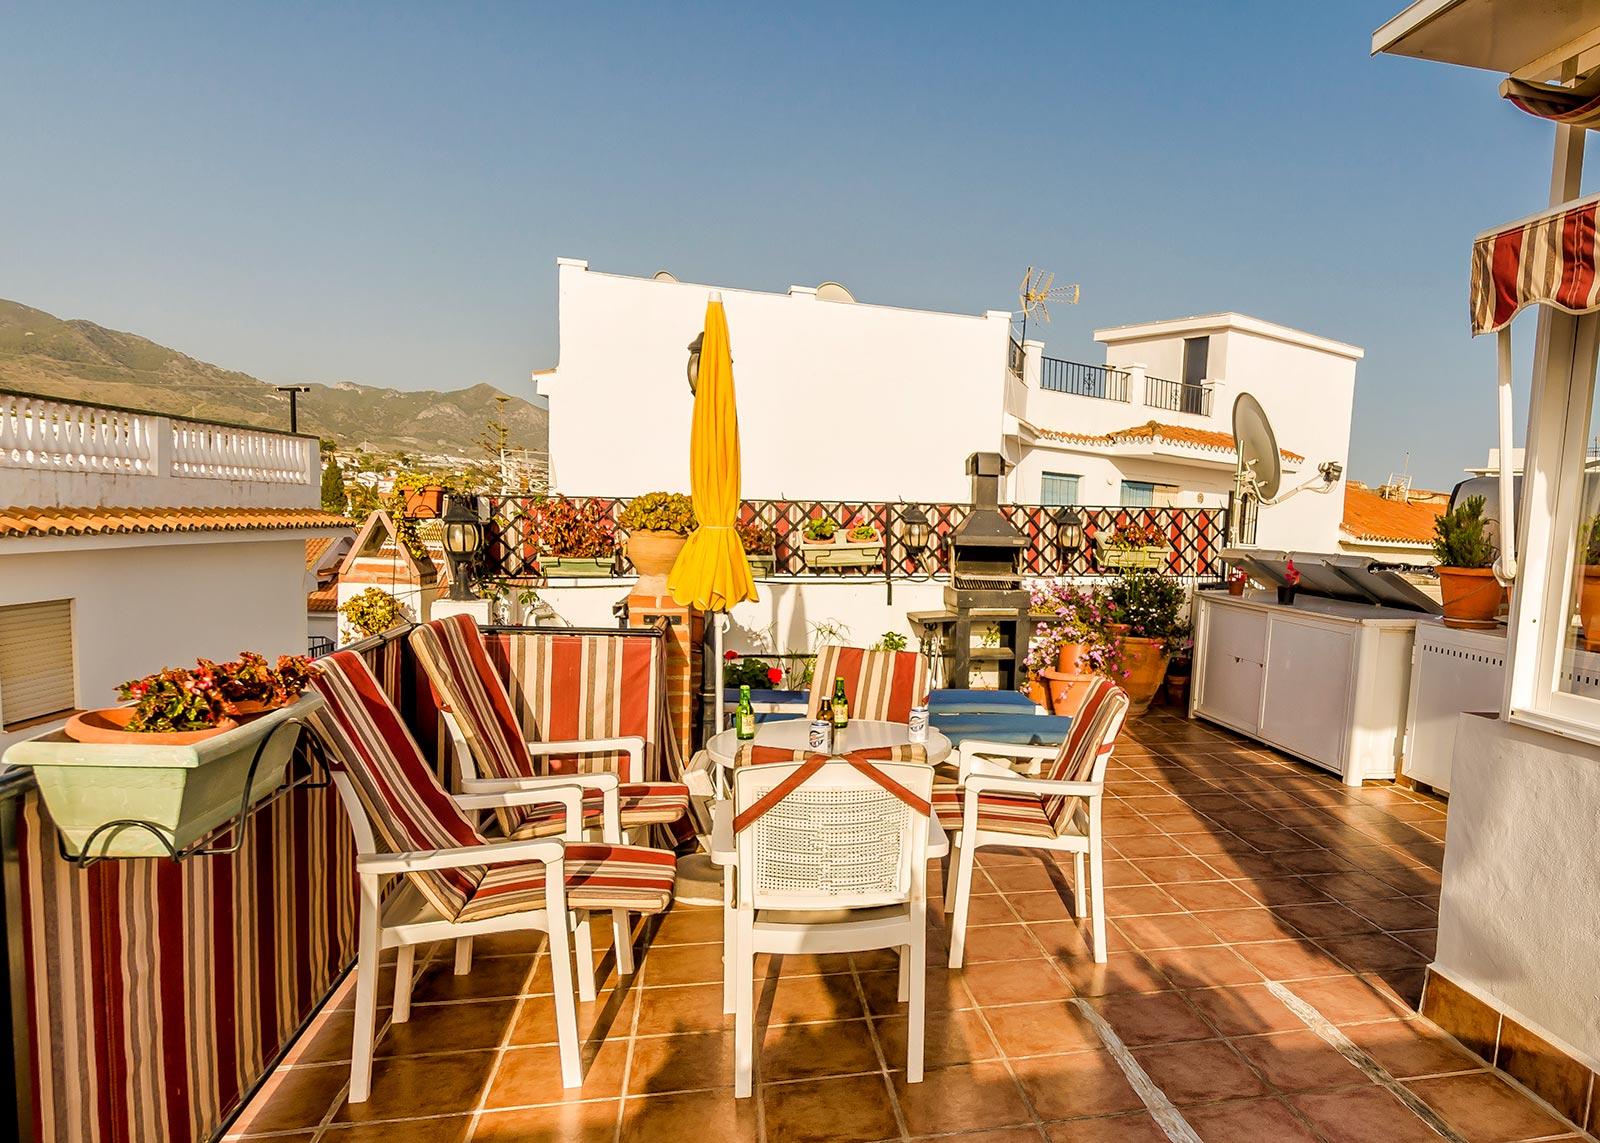 Casa-charlotte terrace